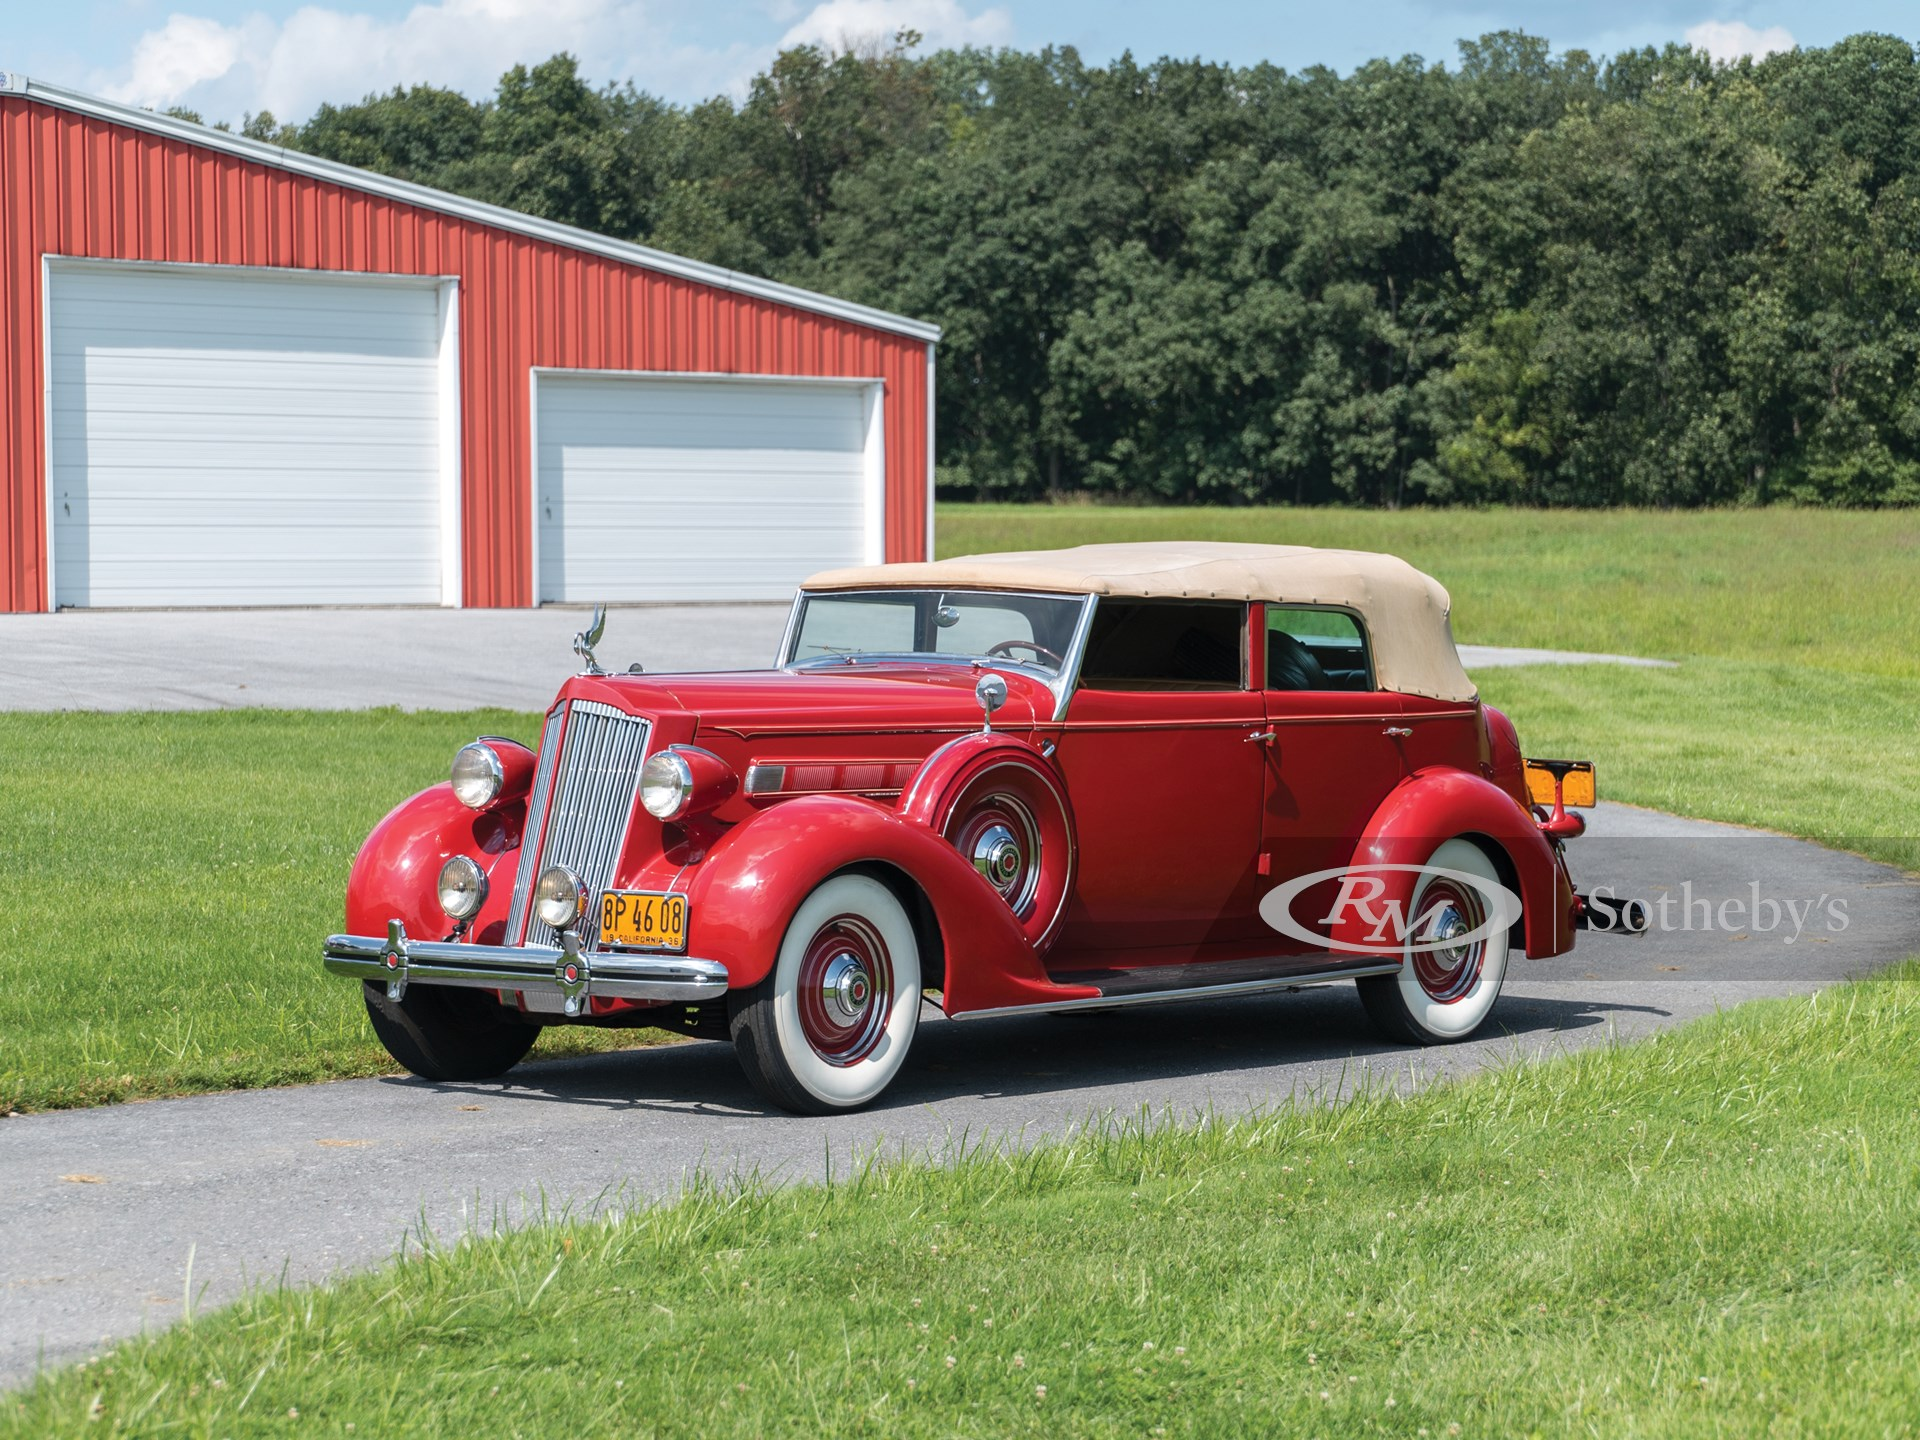 1936 Packard One Twenty Convertible Sedan